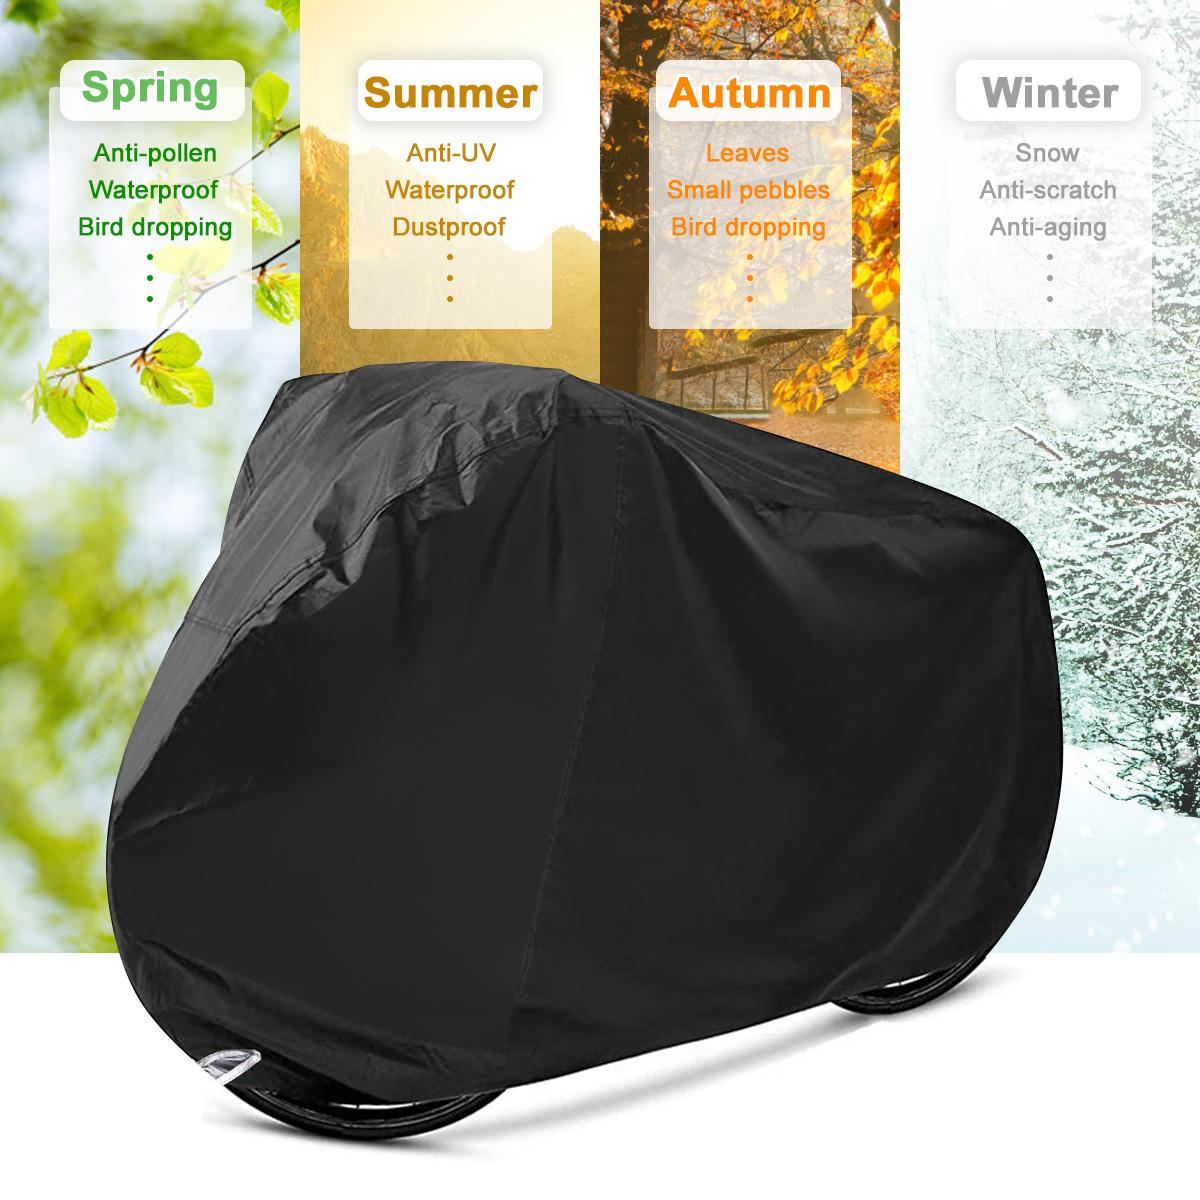 Audew Bike Cover For 2 3 Bikes Waterproof Outdoor Bicycle Oxford Fabric Rain Sun